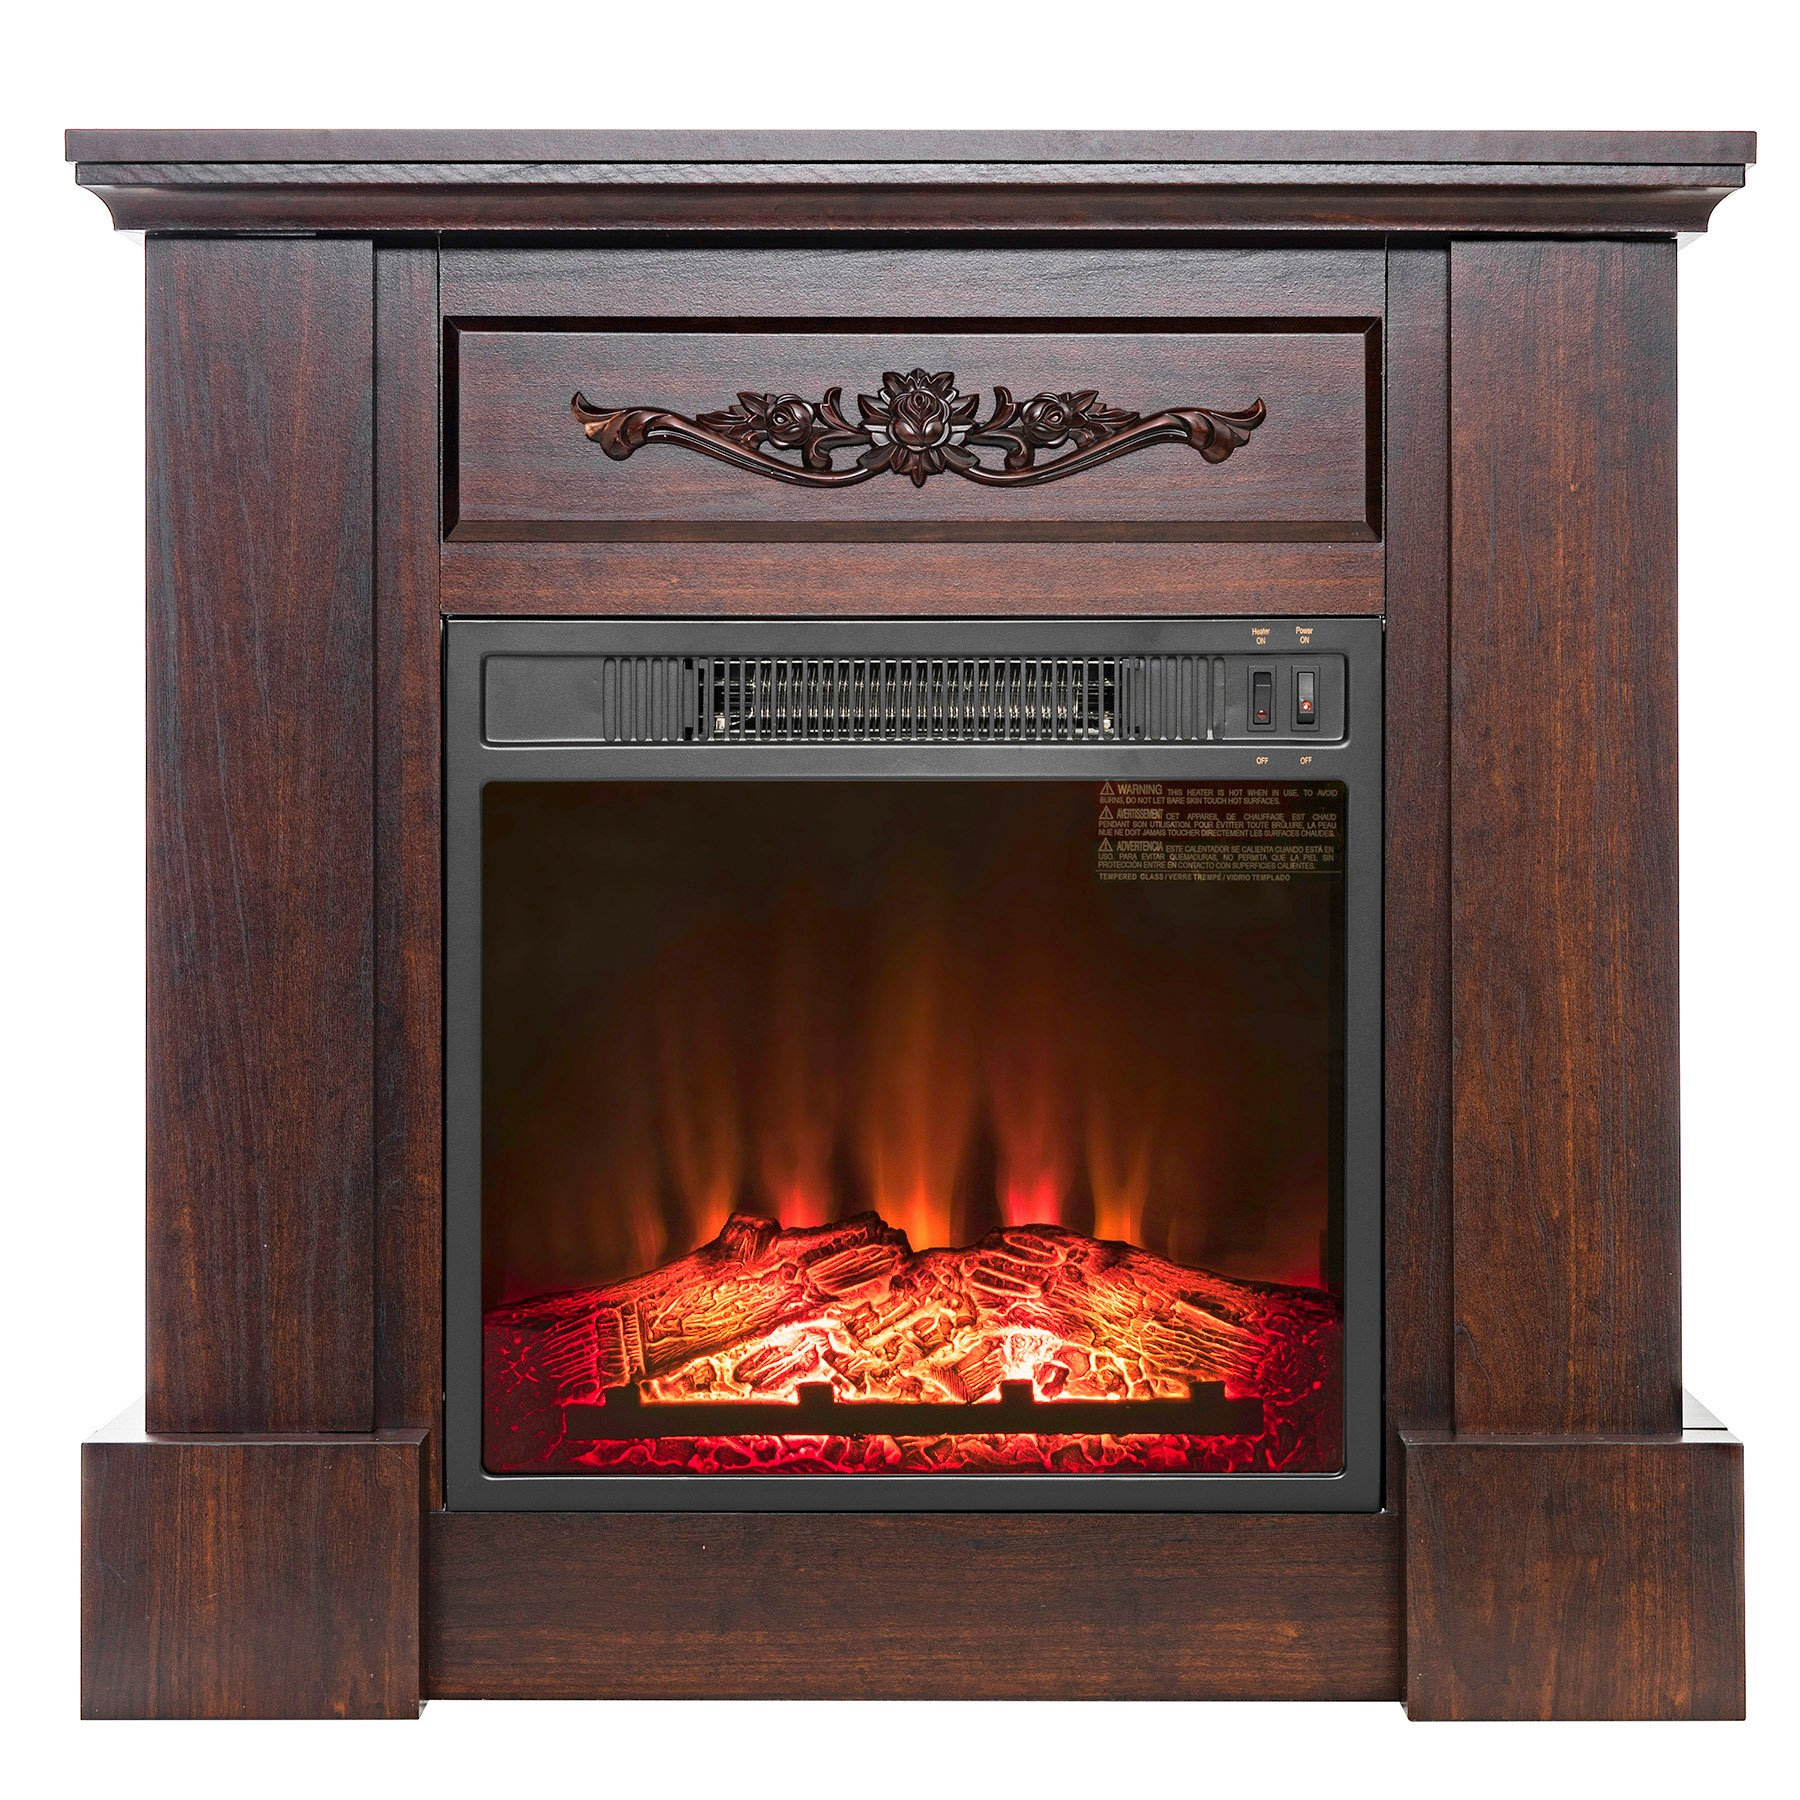 FIREBIRD 32'' Freestanding Insert Brown Wooden Push Button Control Electric Fireplace Stove Heater w/ Log Bed